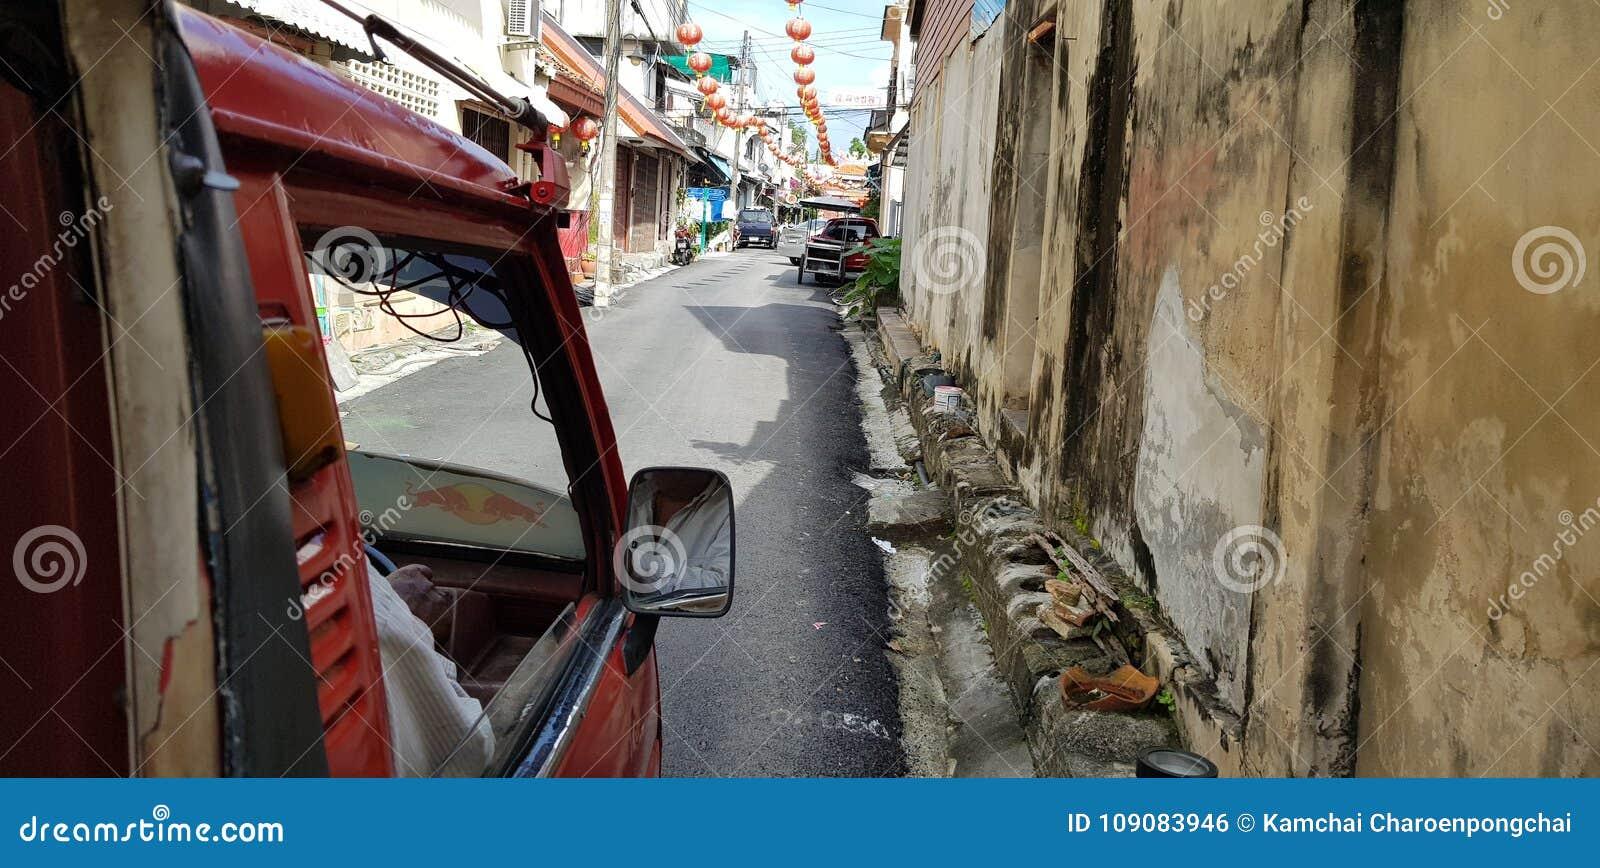 Songkla, Thailand - Jan.27 ,2018 : Mini truck taxi drove through narrow alley in old town